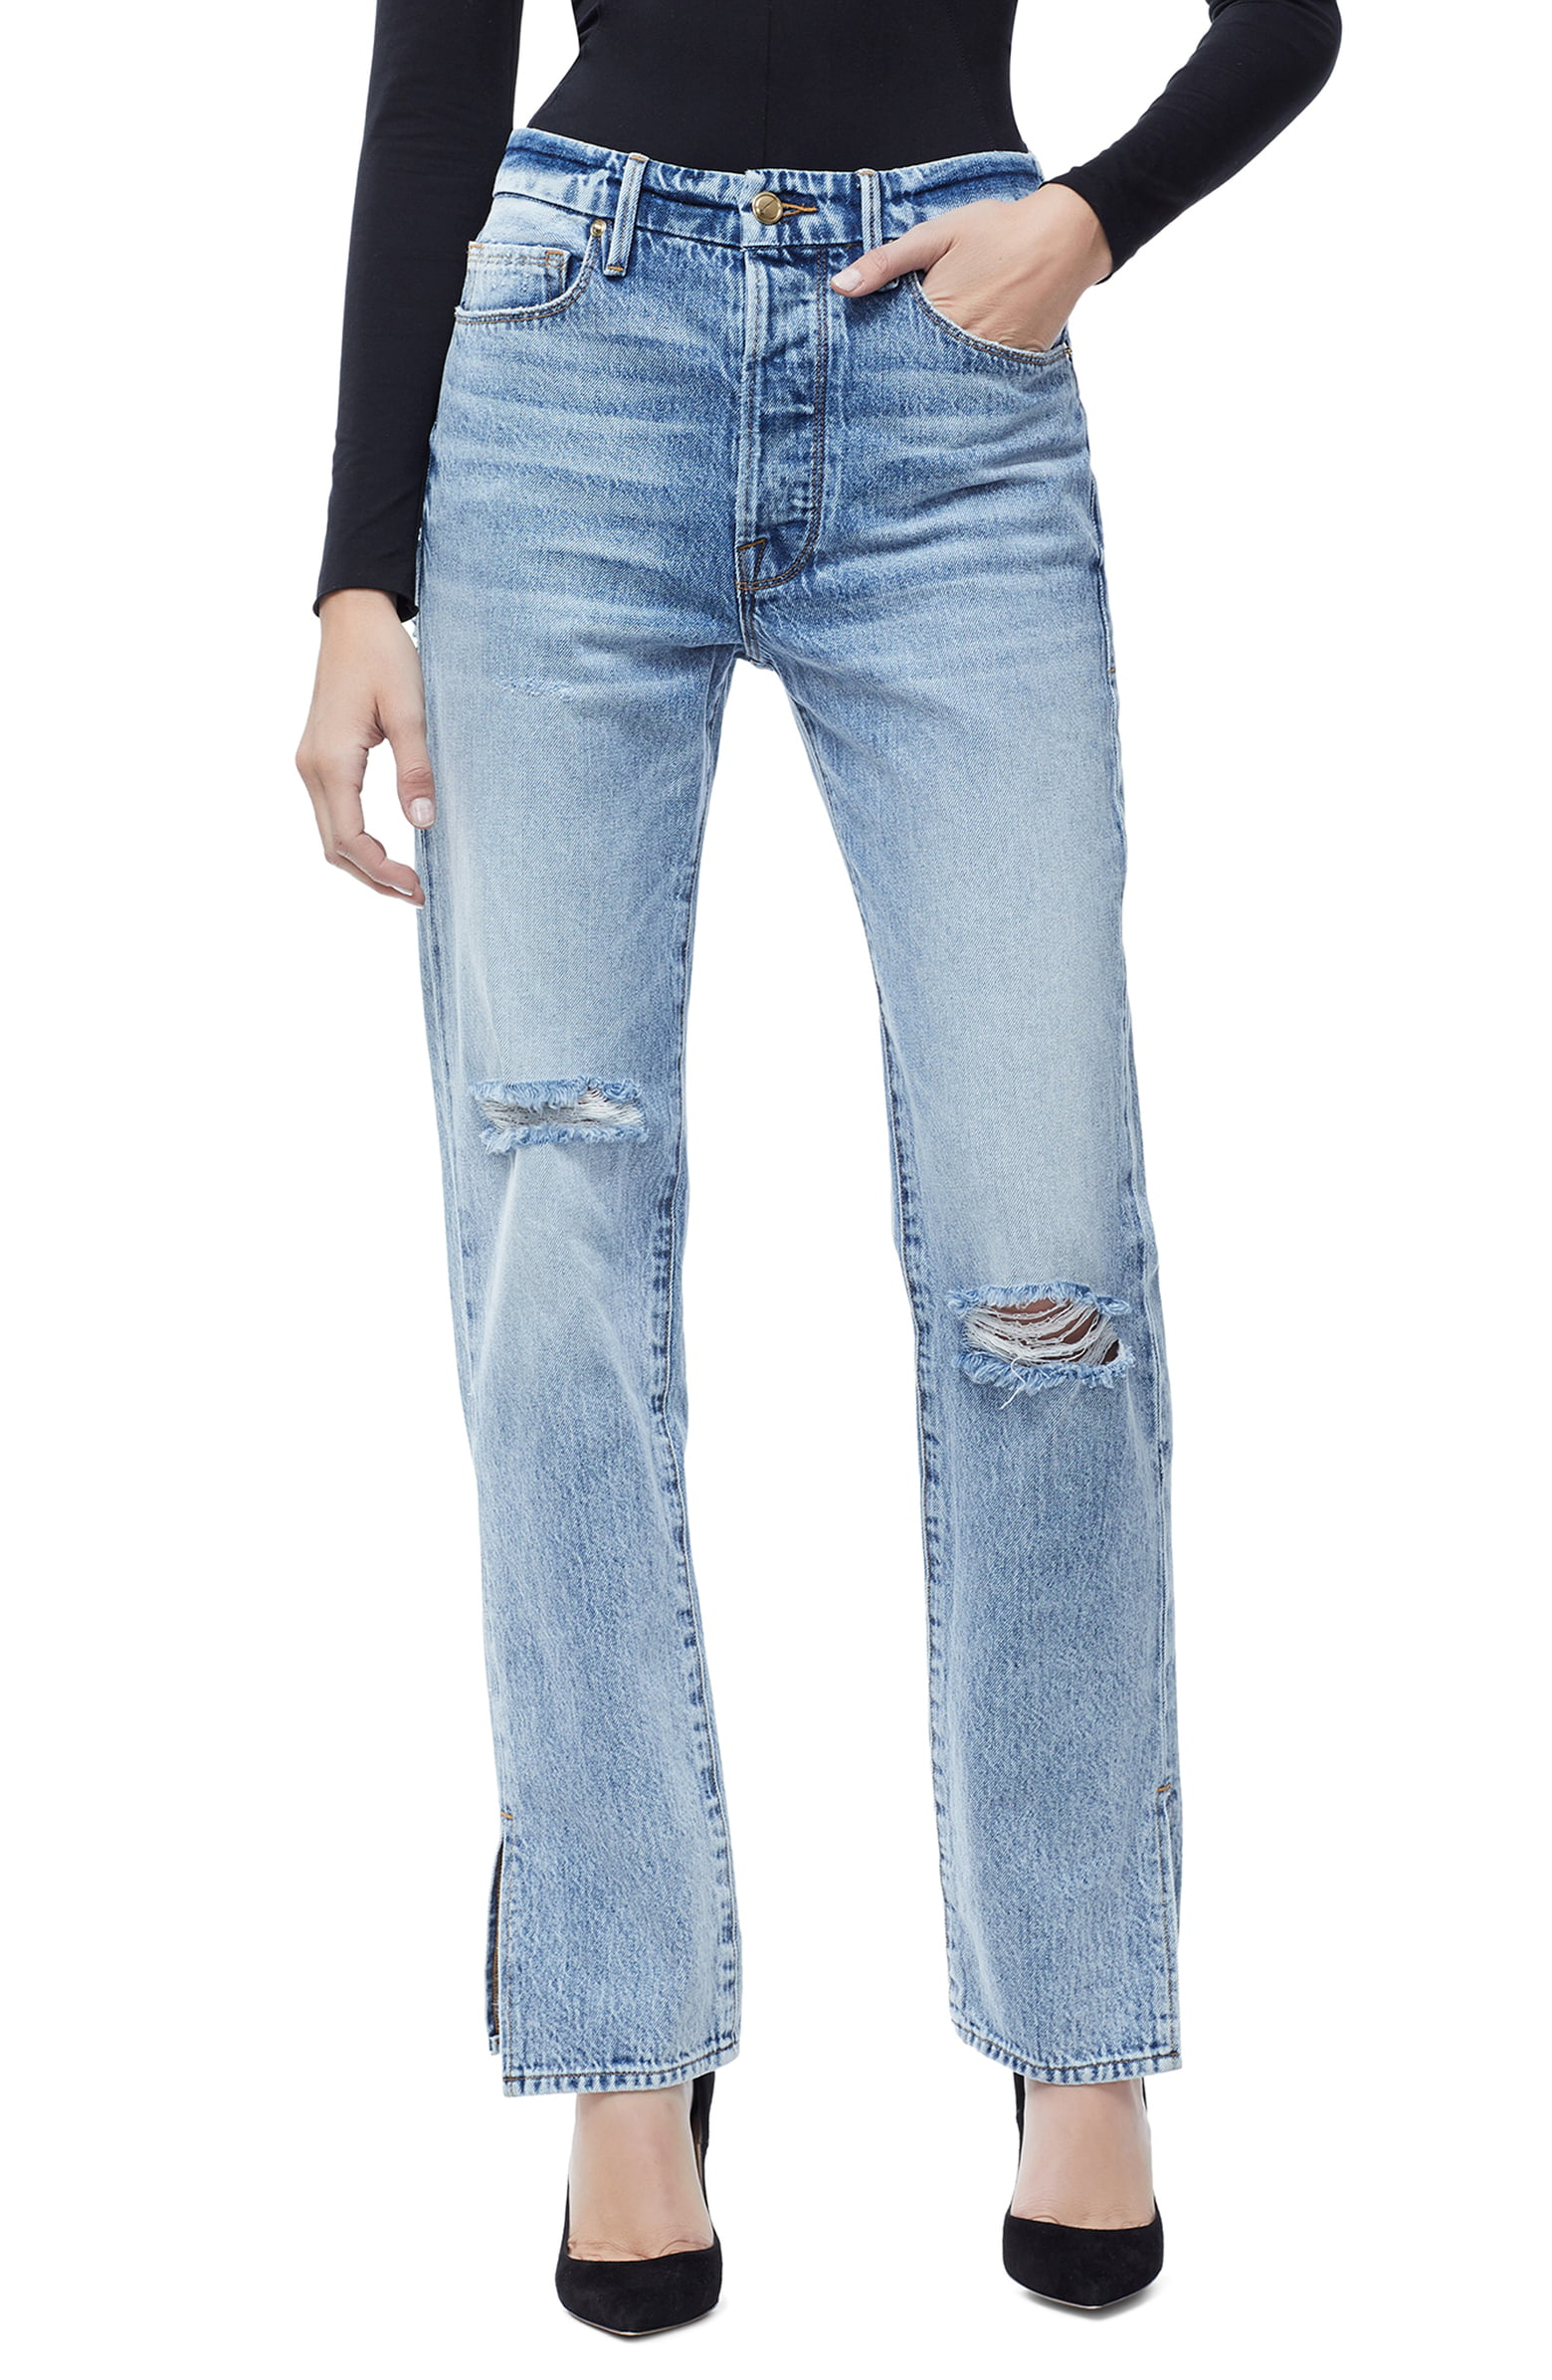 Good American - Good Boy High Rise Ripped Boyfriend Jeans - $179